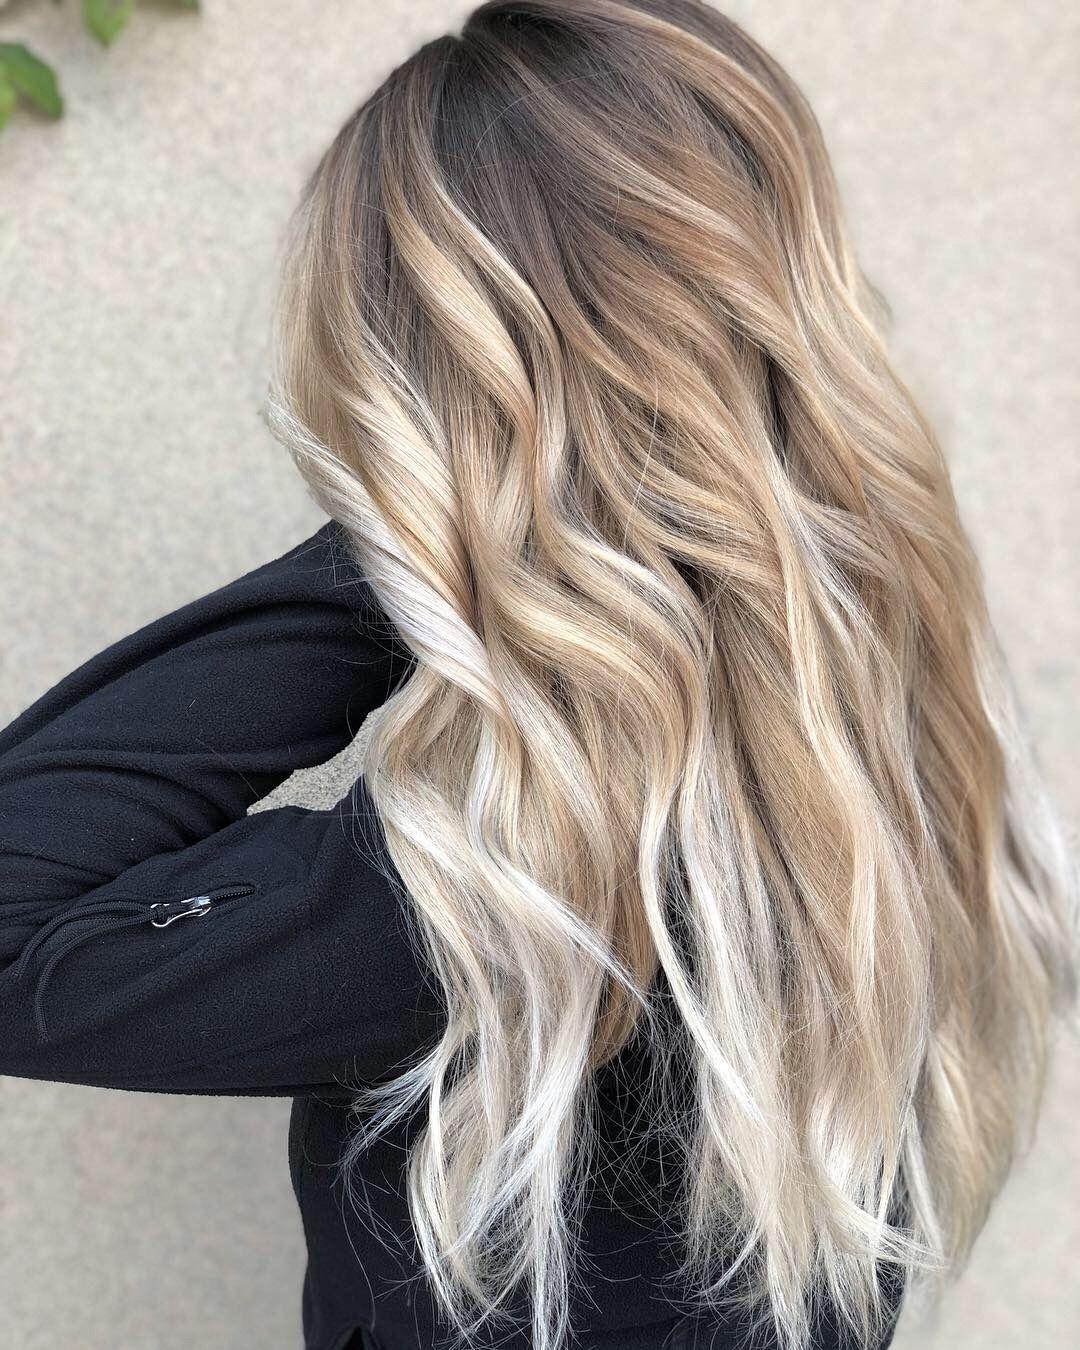 Hair by Nicole Rogers San Mateo,Ca #hairbystylistnic  Long hair